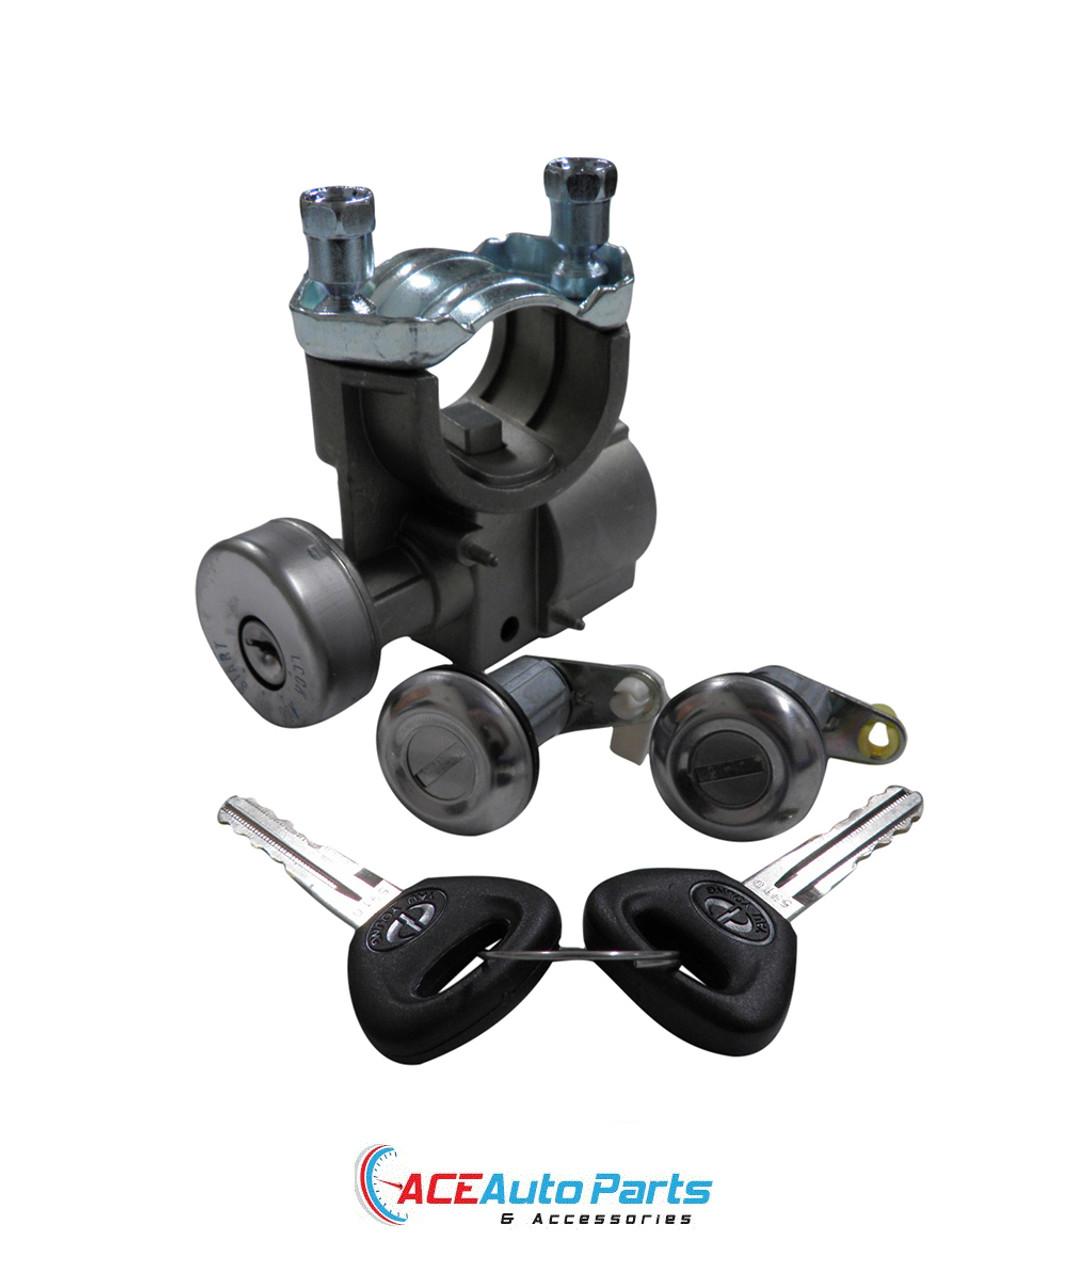 Ignition Barrel + Front Door Locks For Mazda E1400 E1800 E2000 1984-1999